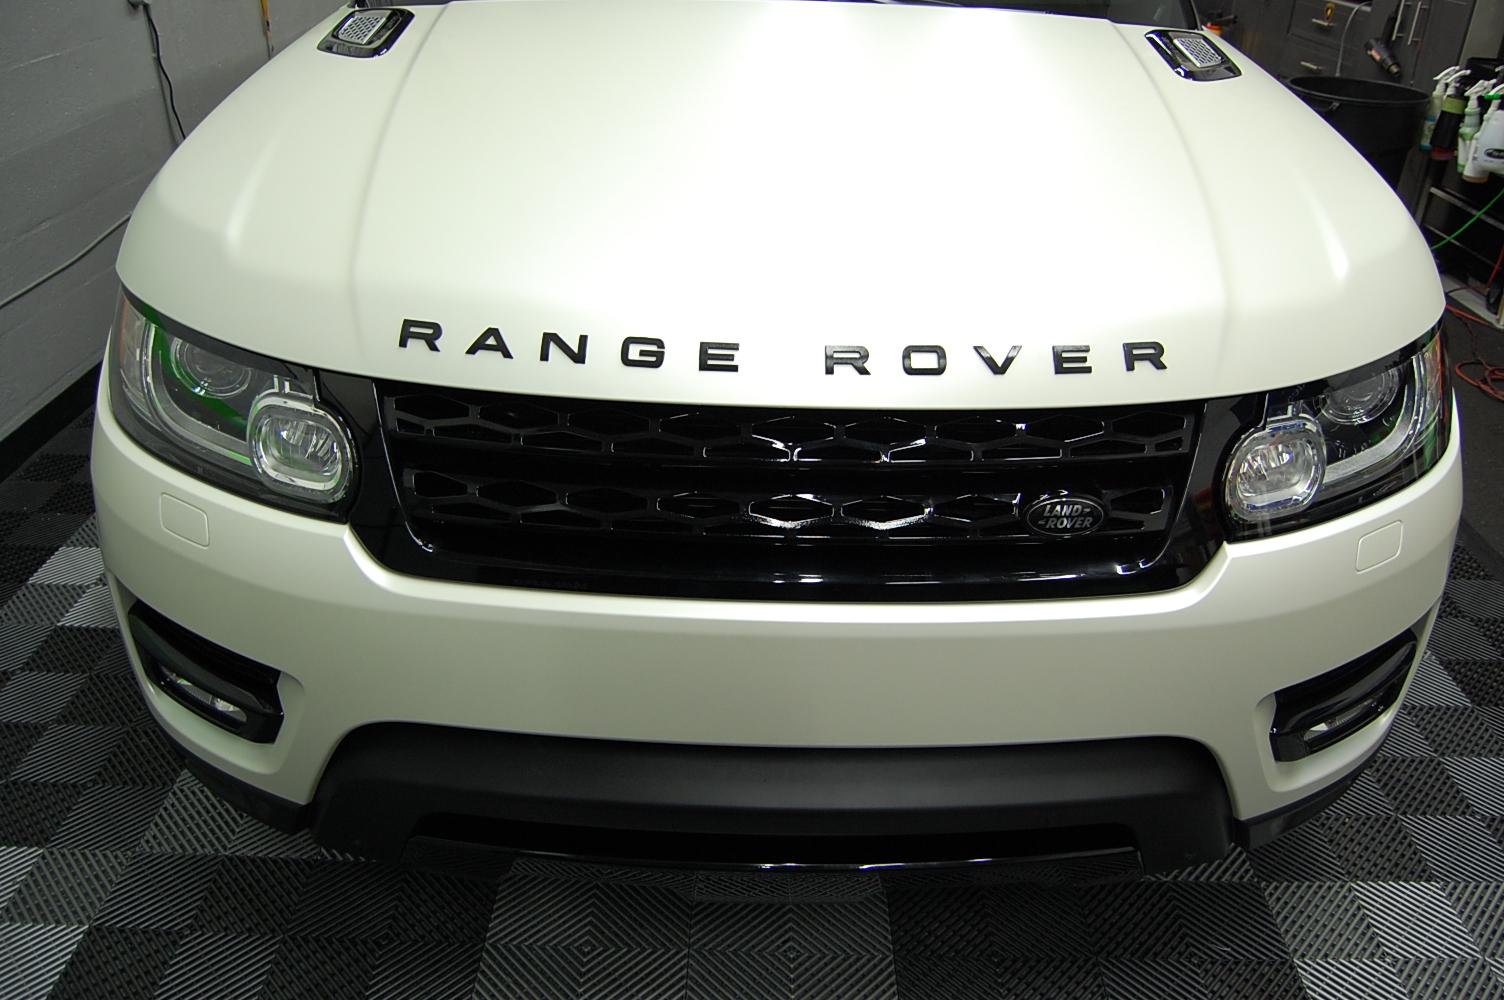 2014 range rover 3m satin pearl white car wrap miami with. Black Bedroom Furniture Sets. Home Design Ideas